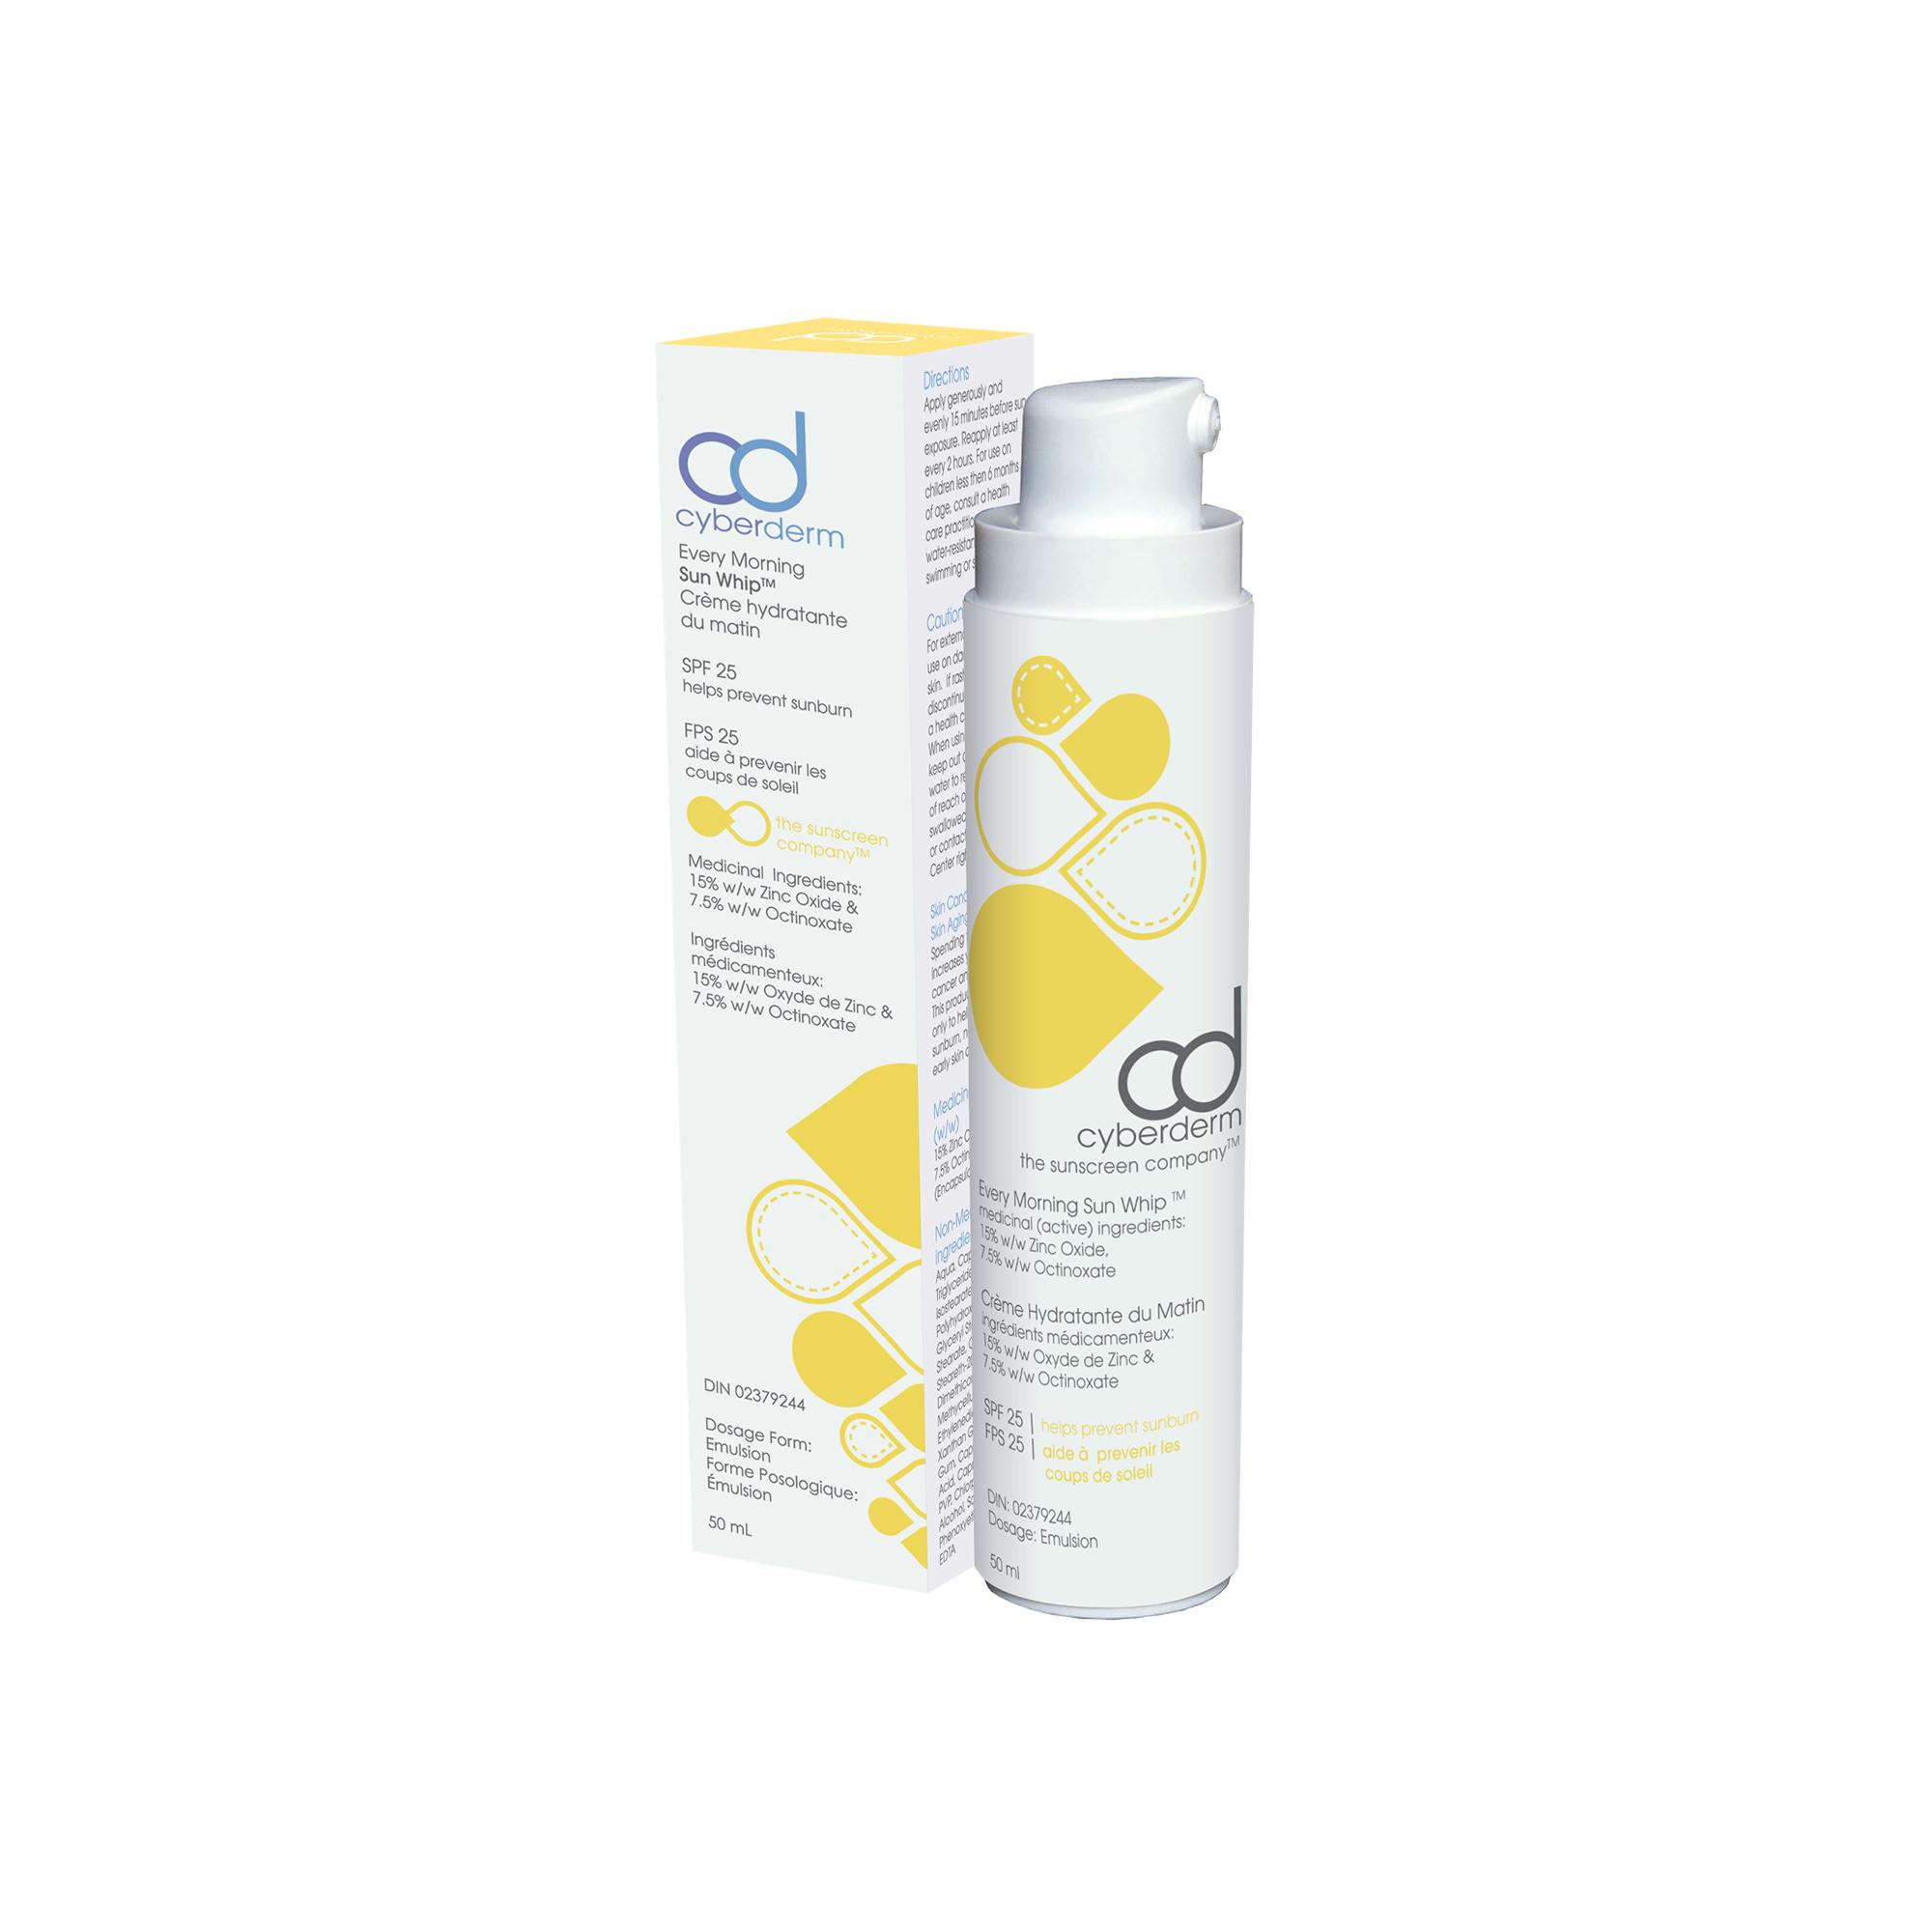 Cyberderm Crème hydratante du matin FPS 25 - 50 ml